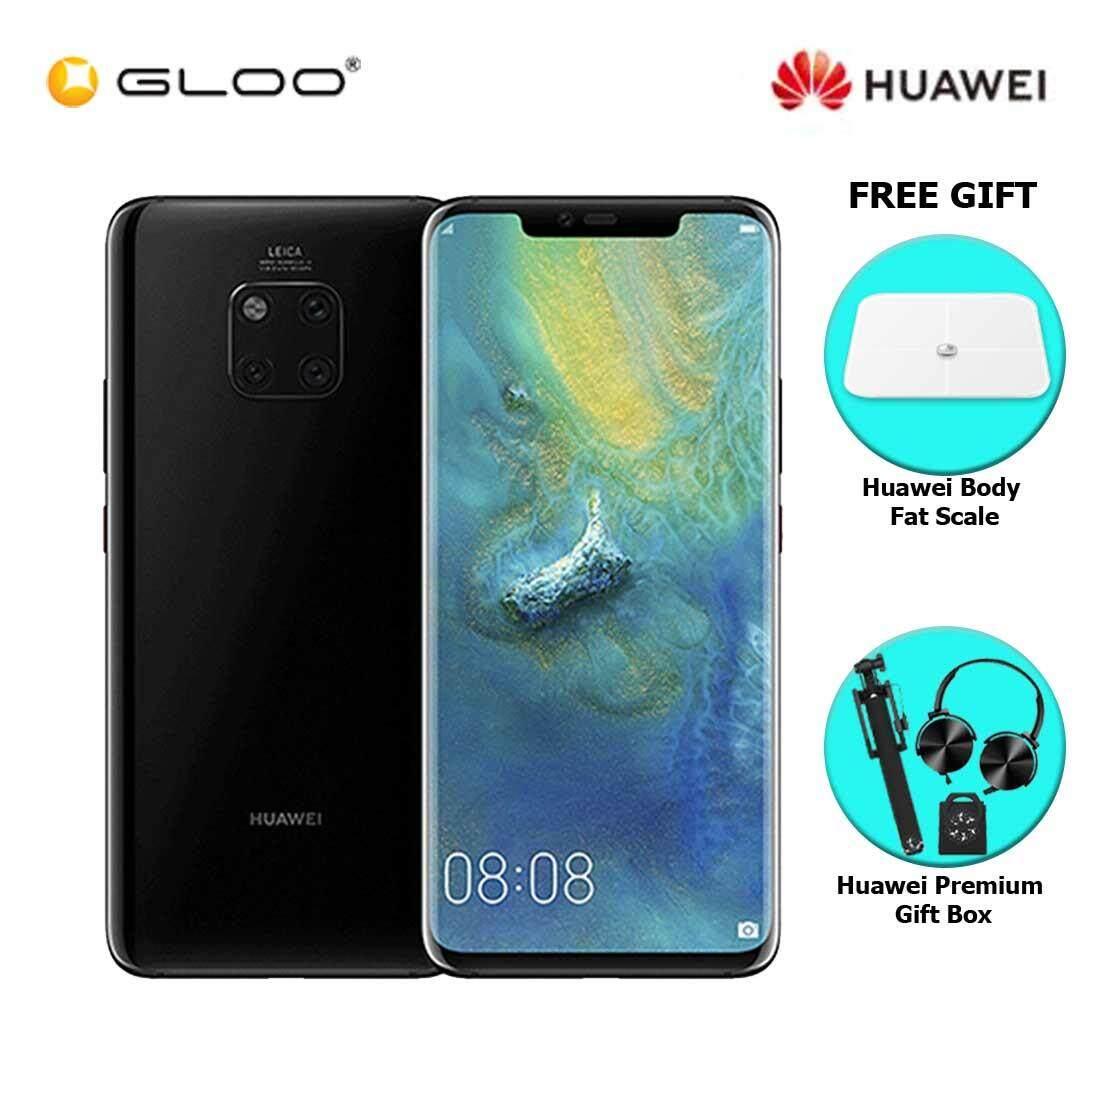 Huawei Mate 20 Pro 6GB+128GB Black + FREE Huawei Body Fat Scale 6901443198375,Premium Gift Box (Headset/Selfie Stick/iRing)